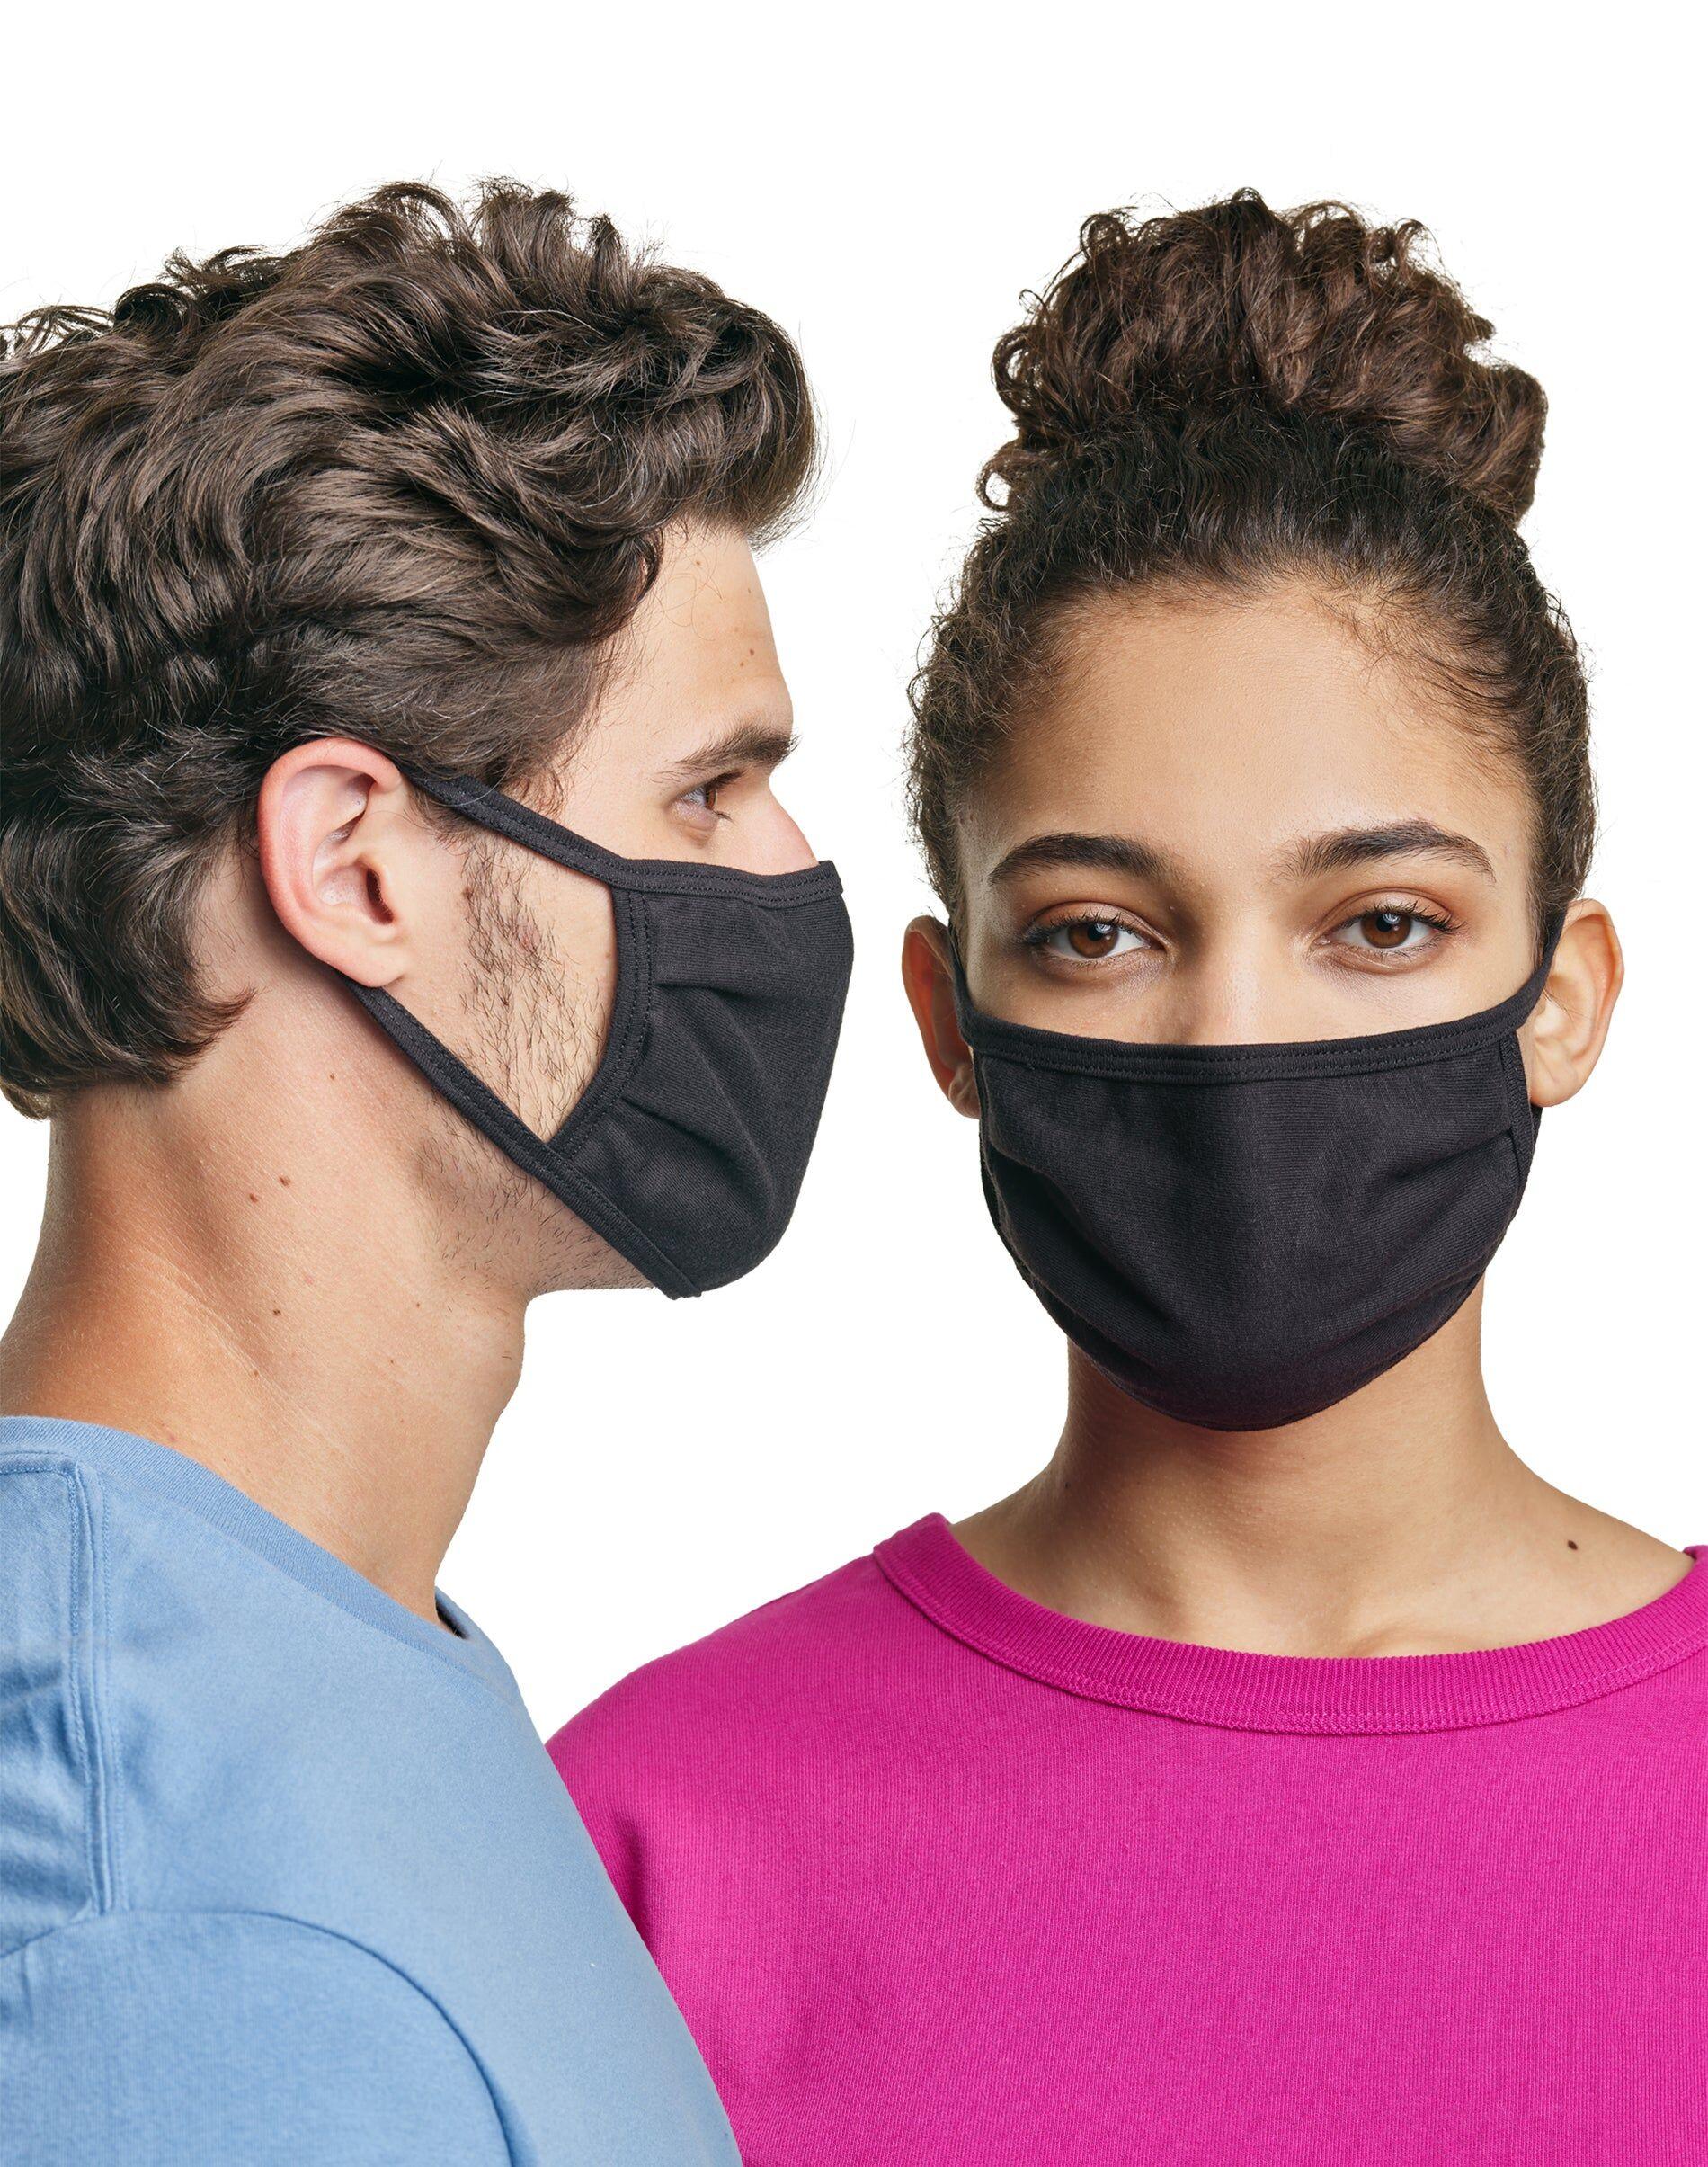 Hanes Wicking Cotton Masks, 50-Pack Black Unisex